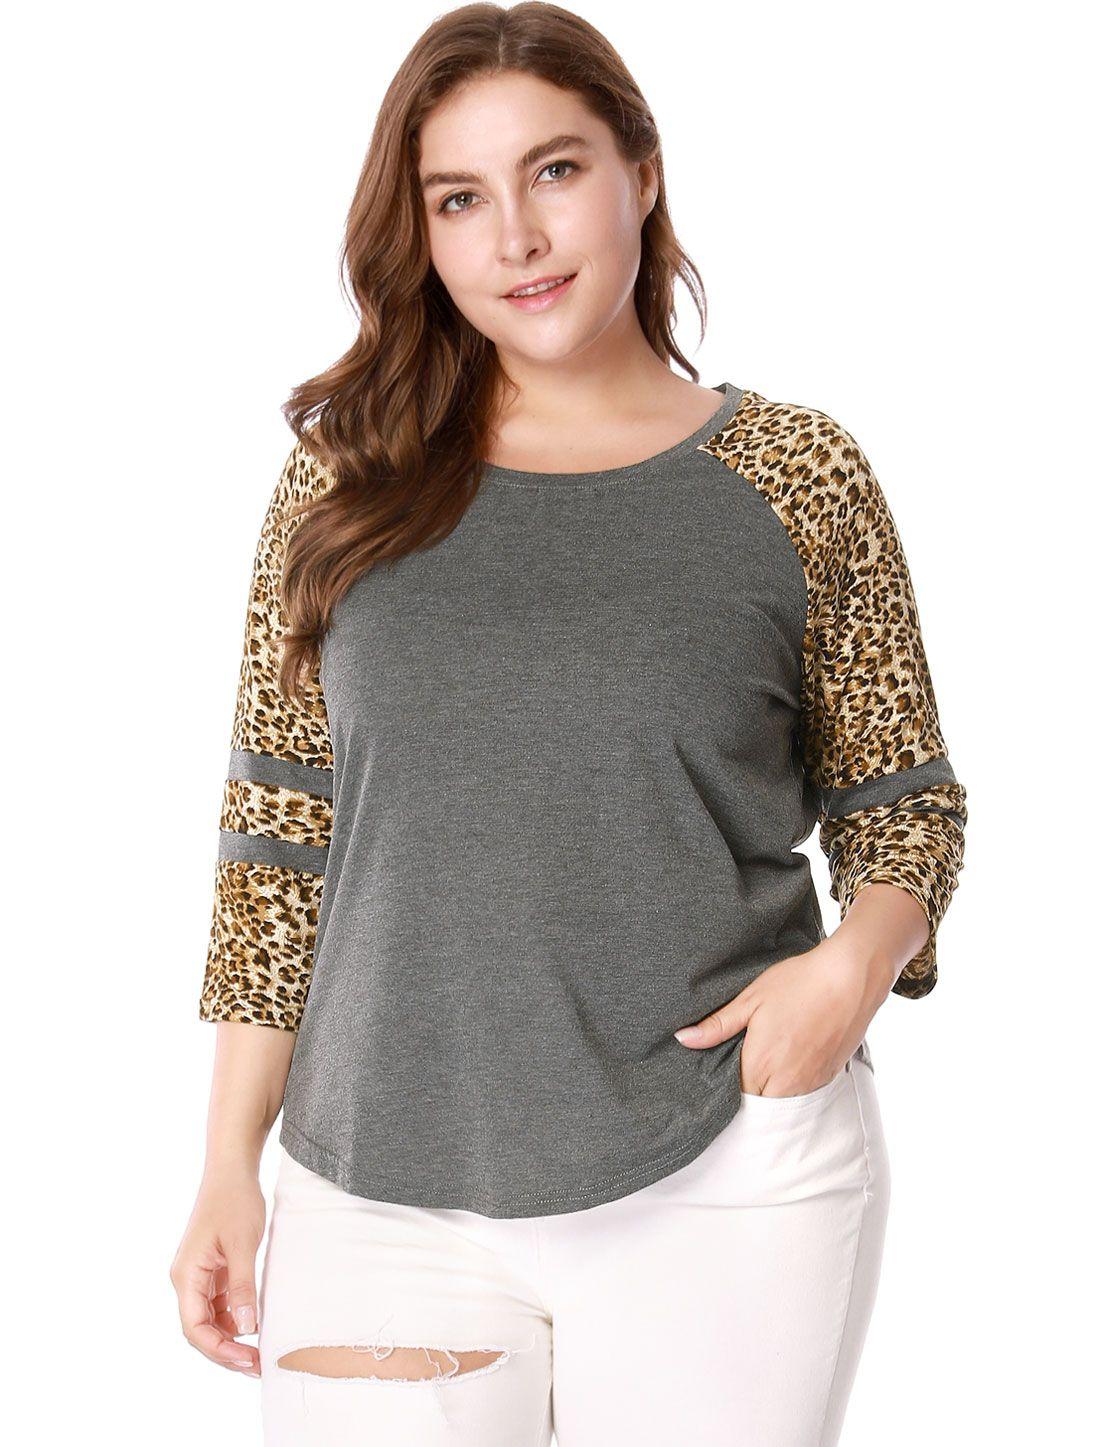 e0dc2b0c99b8b Women Plus Size 3 4 Raglan Sleeve Contrast Leopard Print T-shirt - Top    Blouses